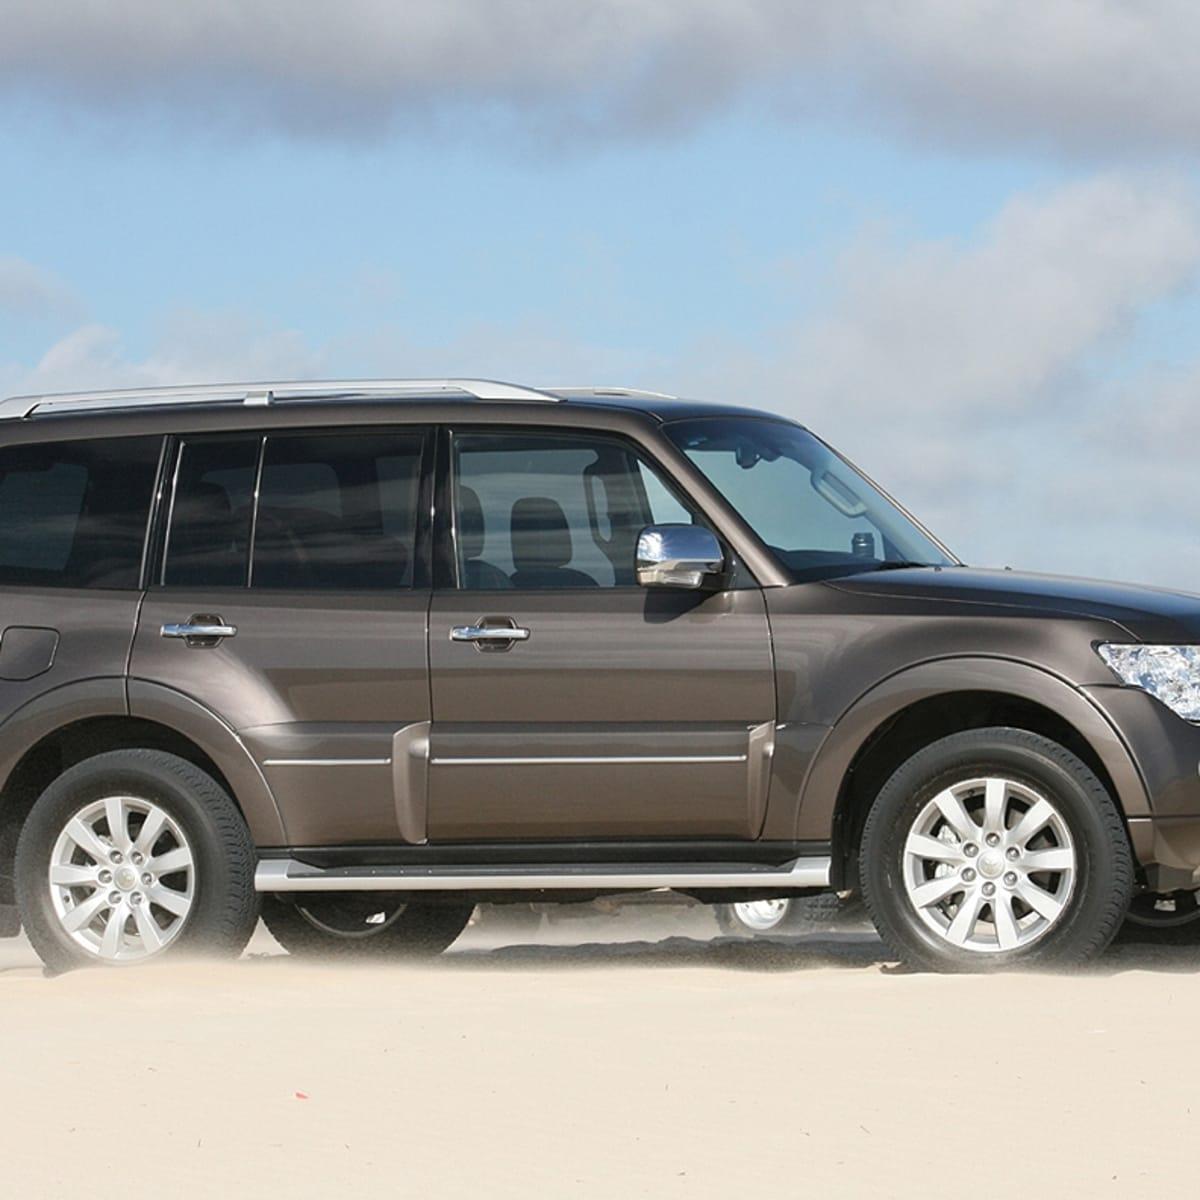 Mitsubishi Pajero Review & Road Test | CarAdvice